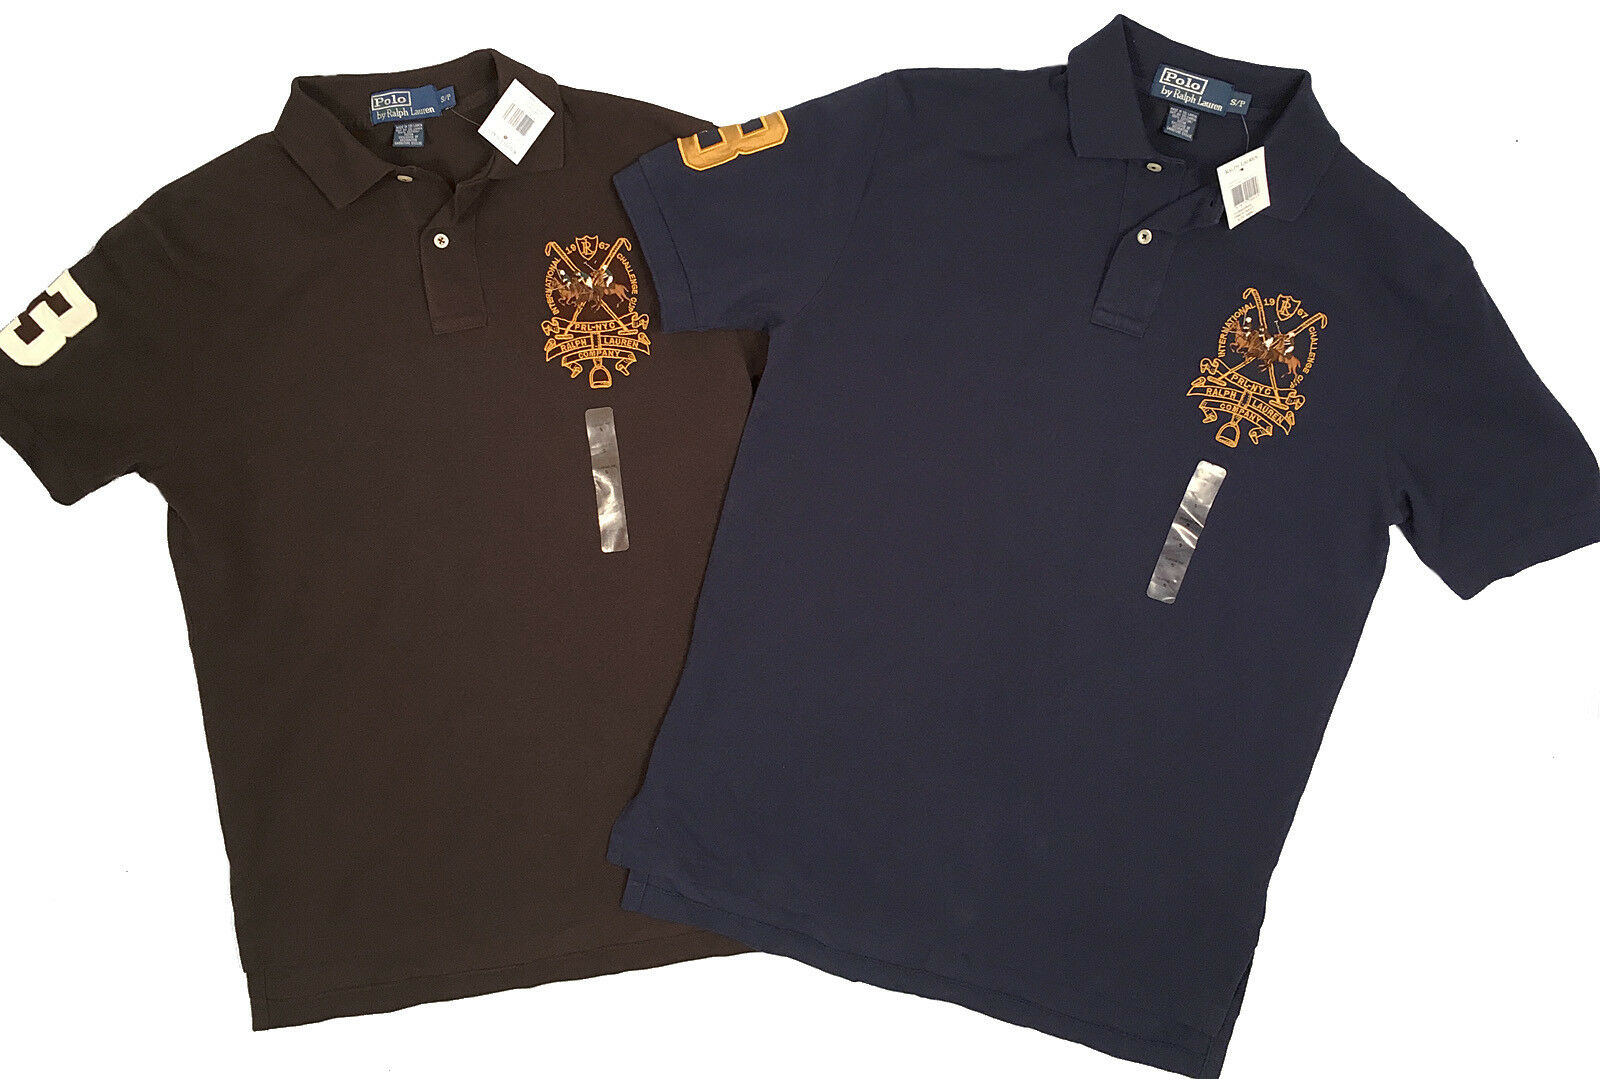 NEW  Polo Ralph Lauren Polo Shirt   Classic Fit   5 colors  Big Pony Match